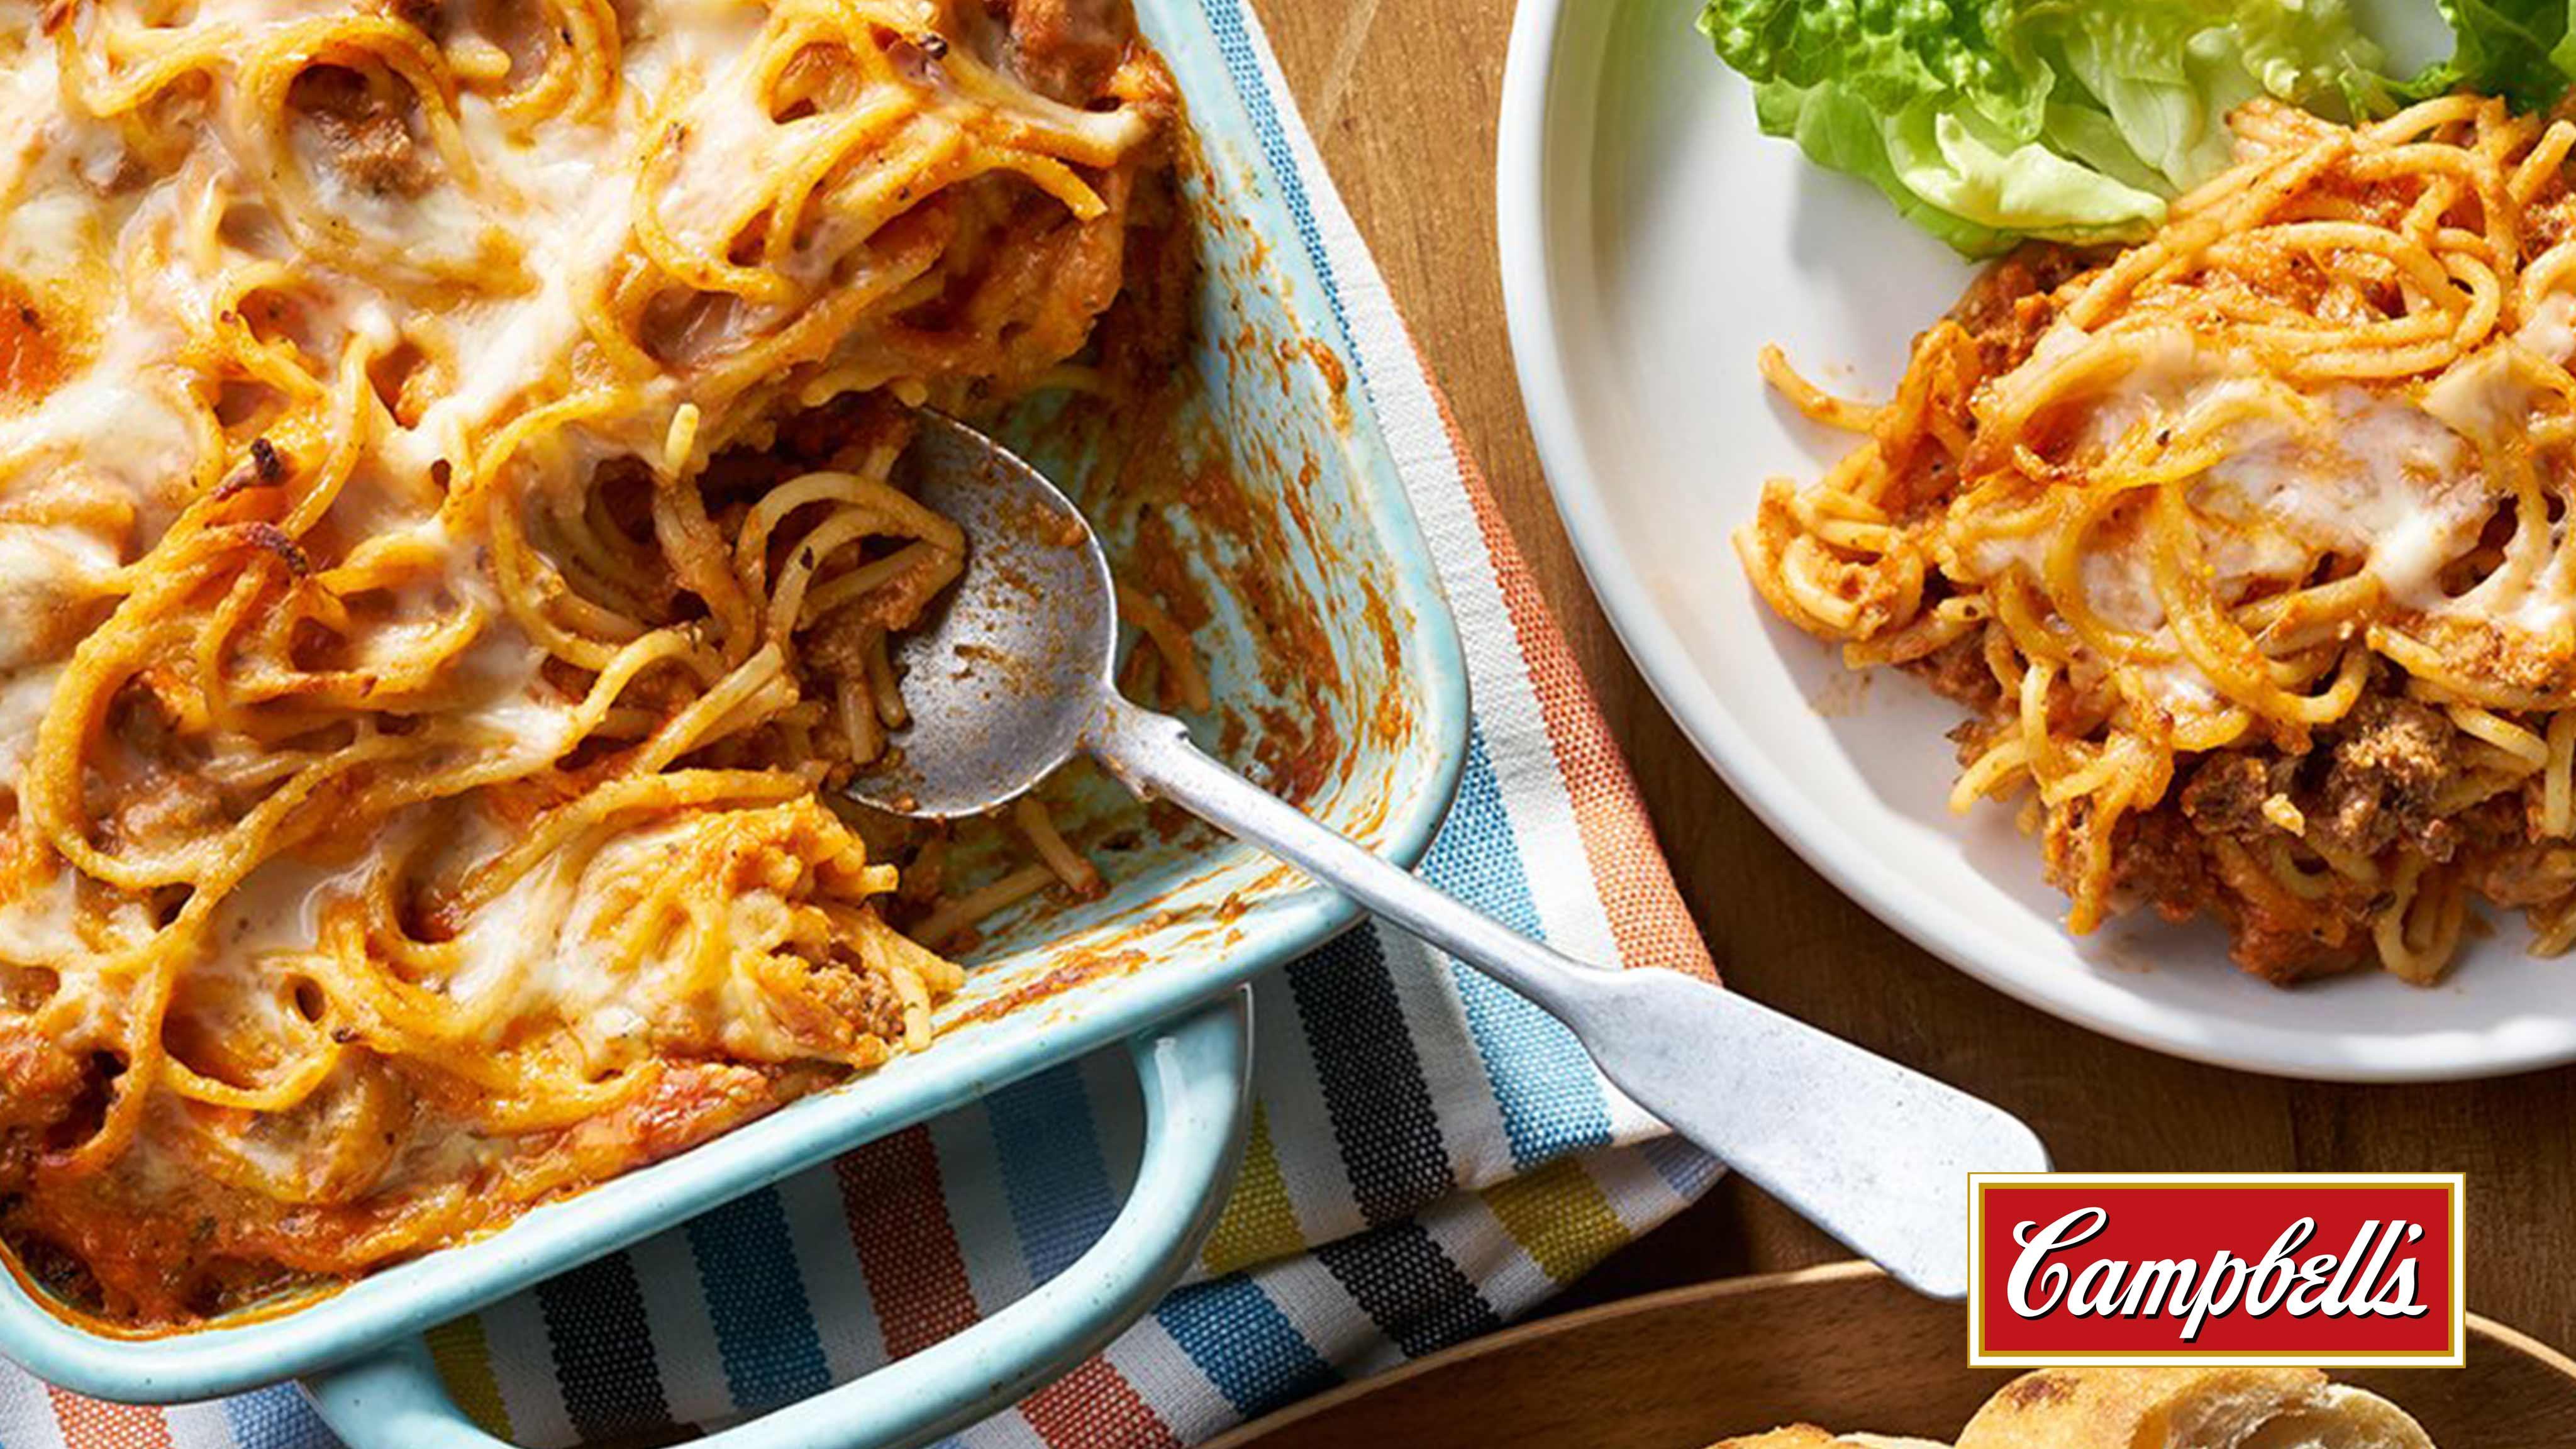 Image for Recipe Baked Spaghetti